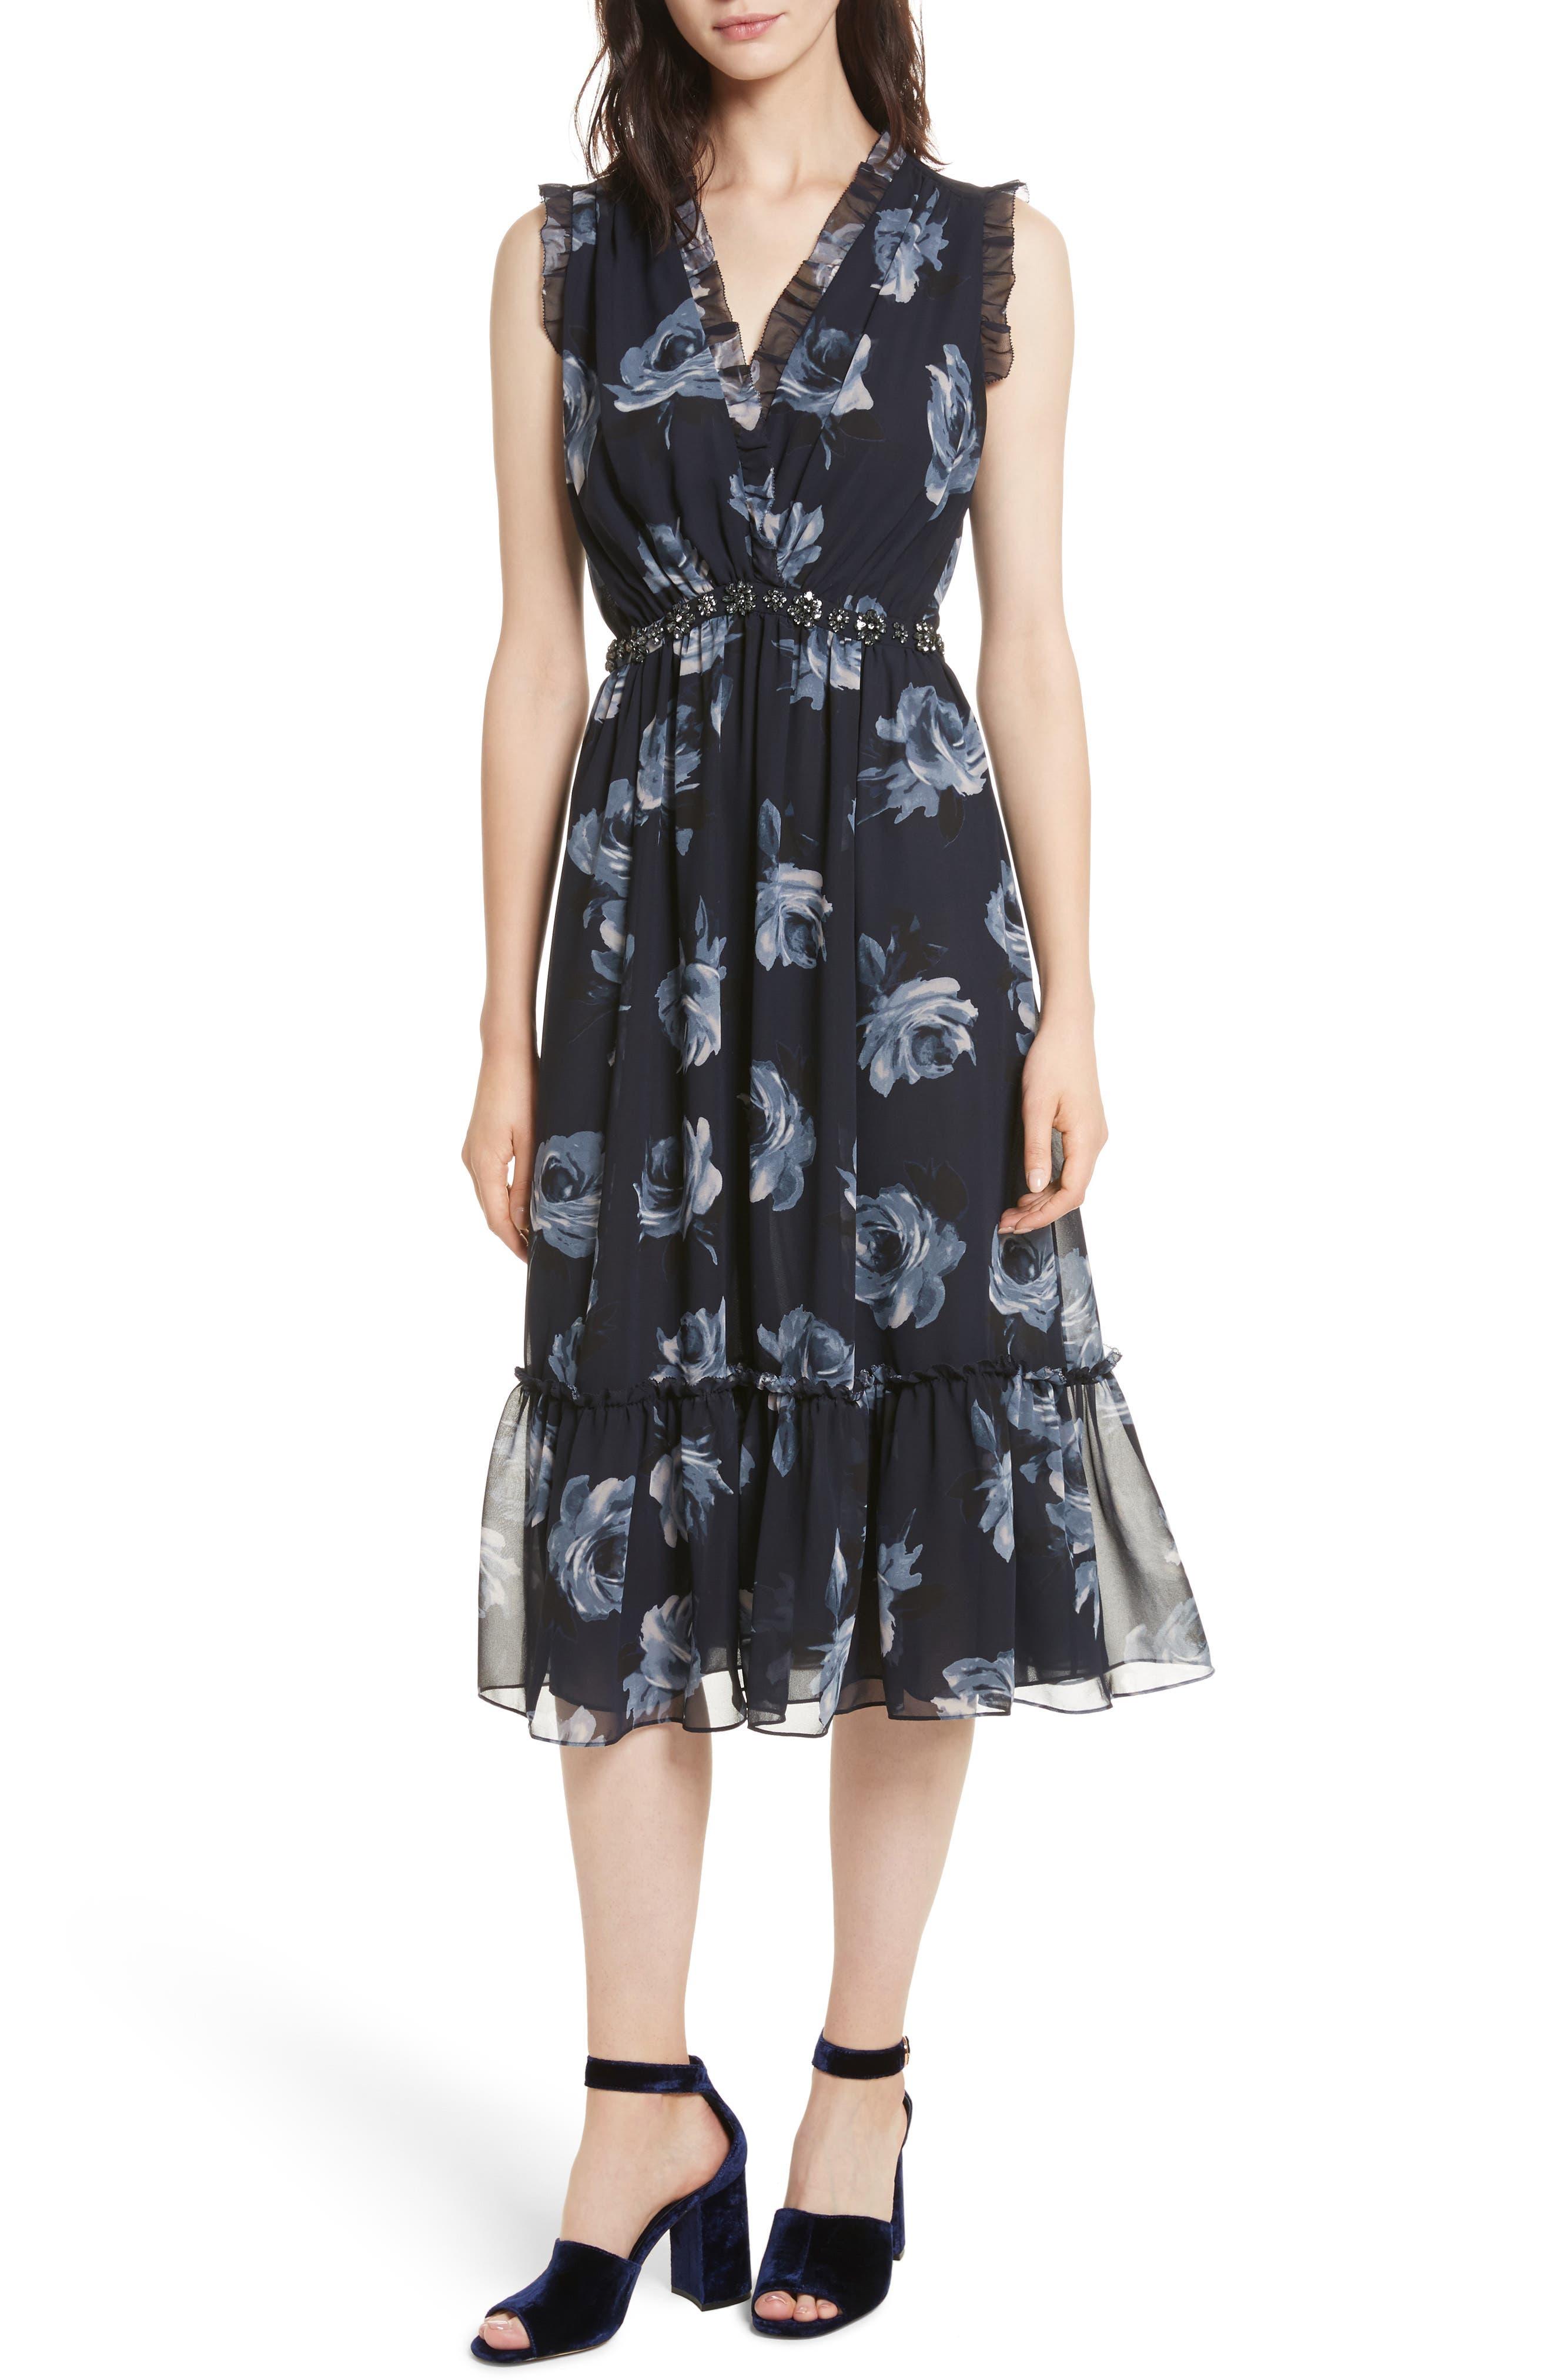 kade spade new york Night Rose Chiffon Midi Dress,                         Main,                         color, Rich Navy